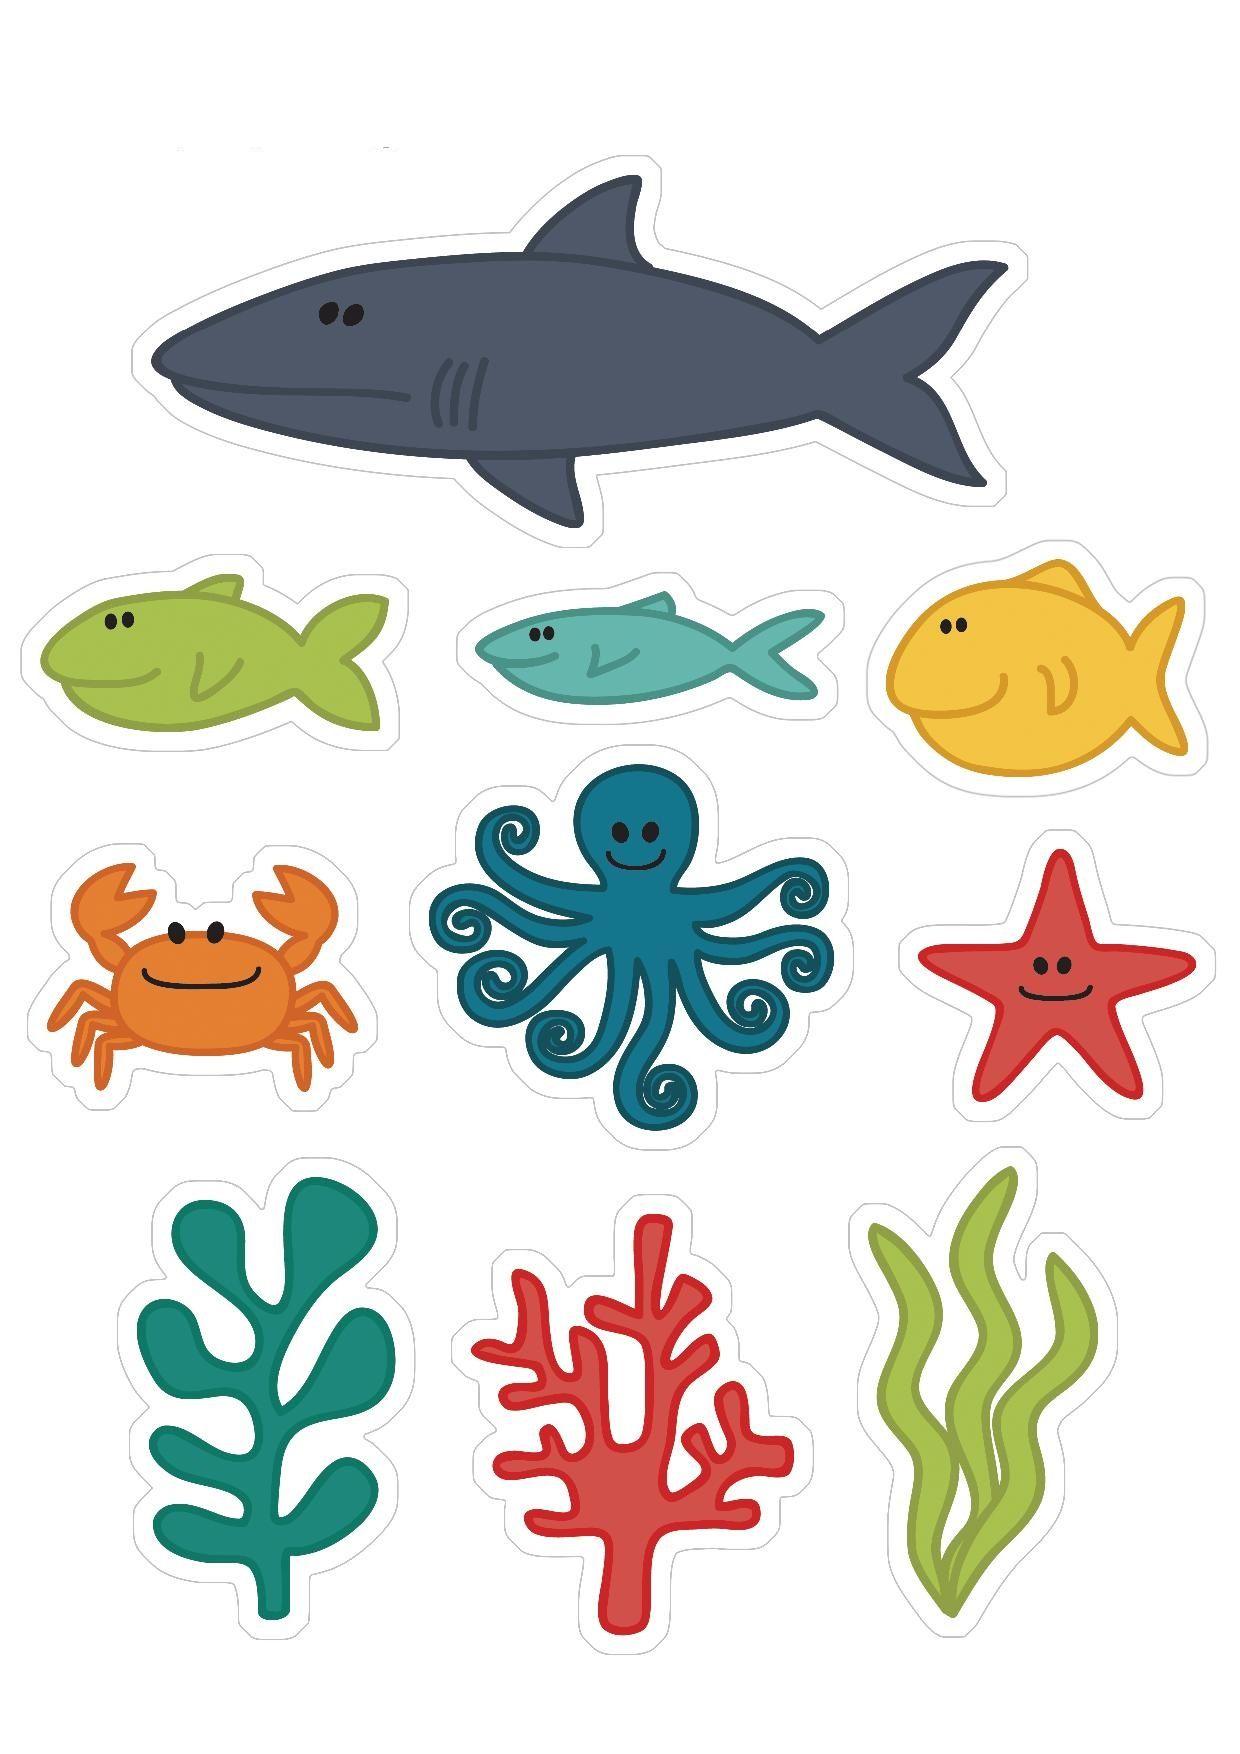 Okyanus Hayvanlari Calismalari Boyama Sayfalari Hayvan Okyanus